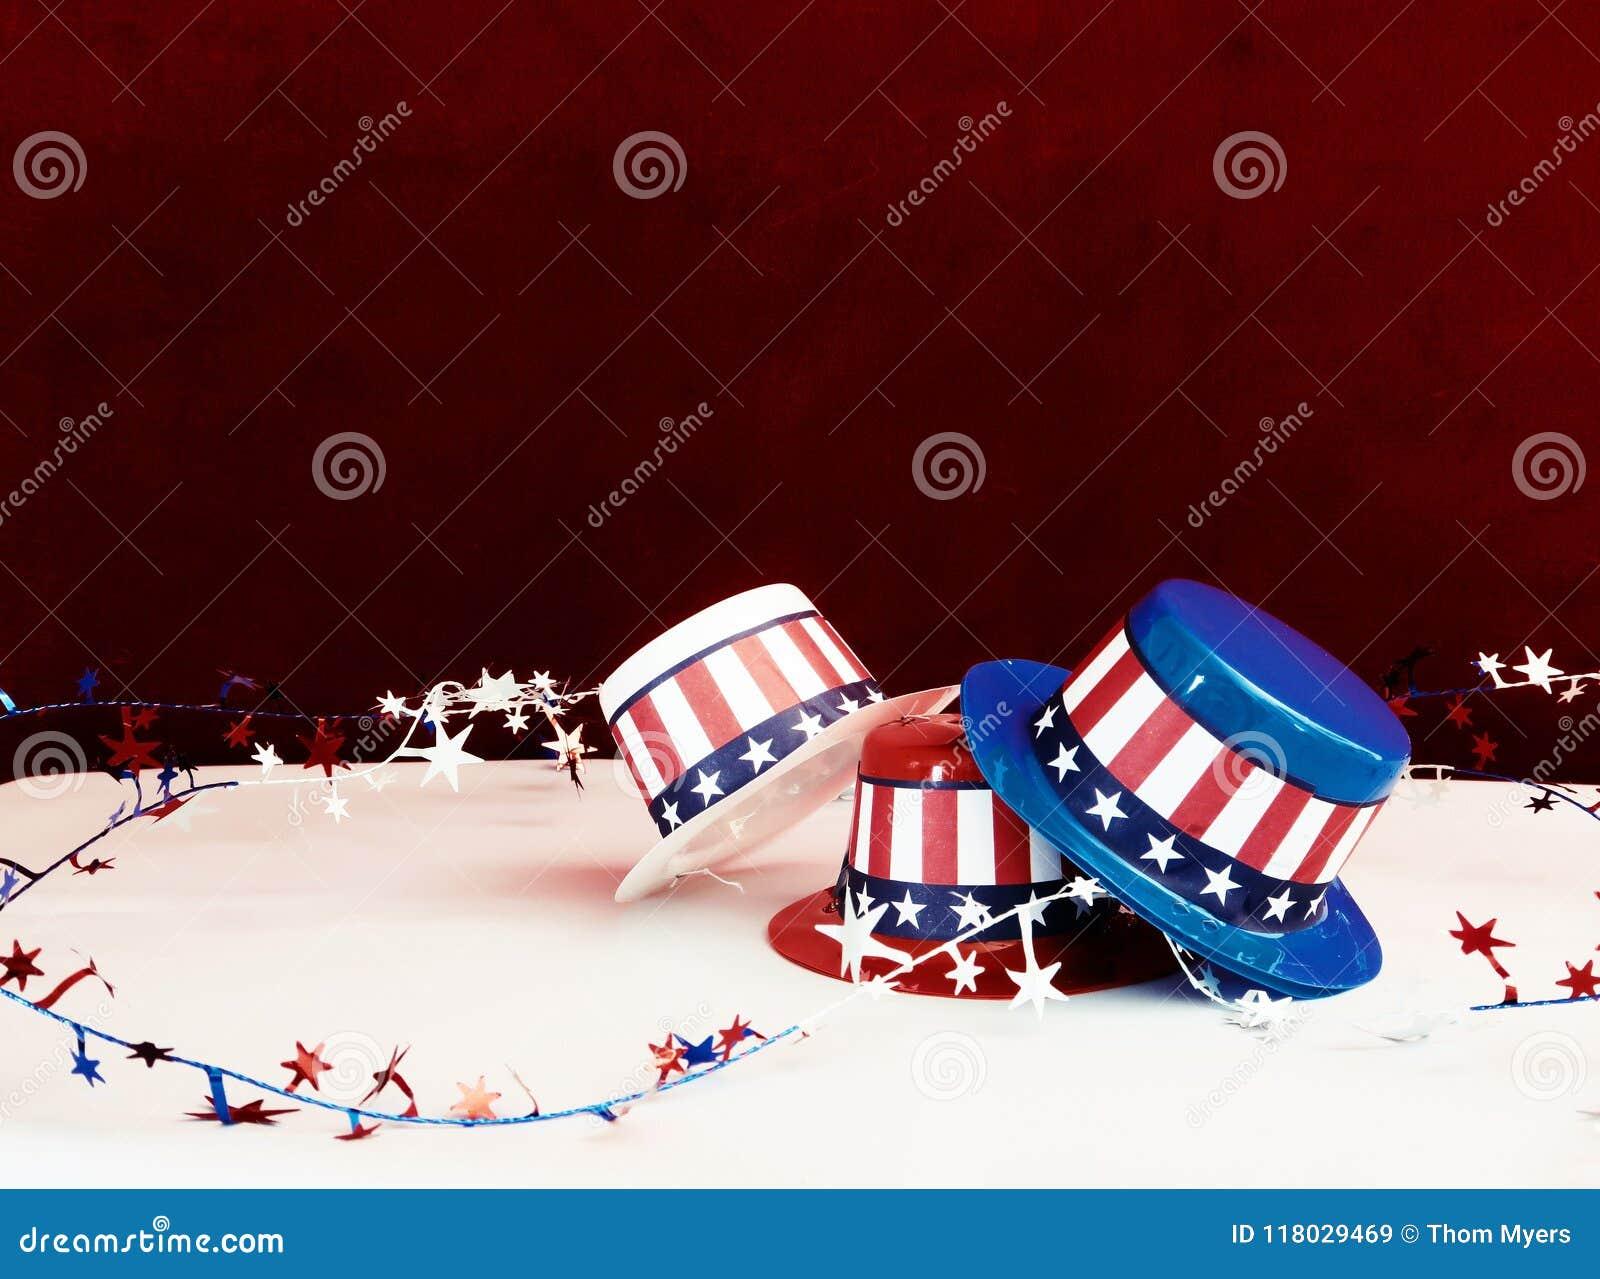 Decorative patriotic hats stock image  Image of decorative